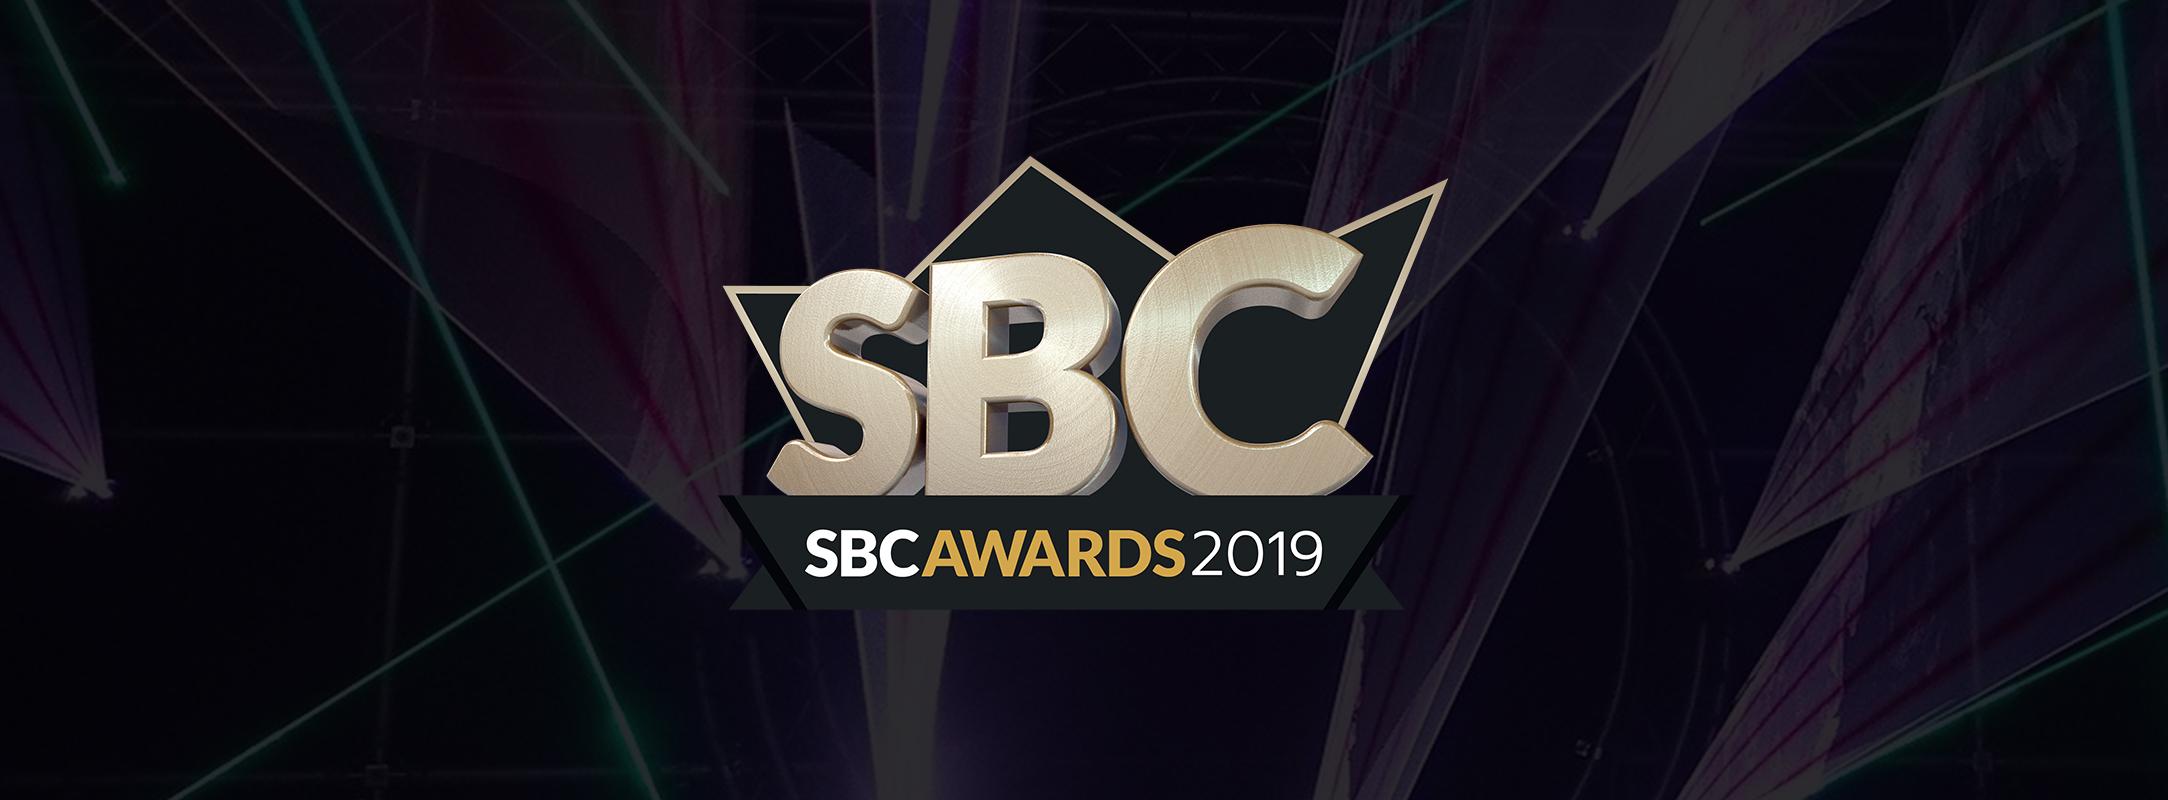 LeoVegas & Bet 365 Big Winners At SBC Awards 2019